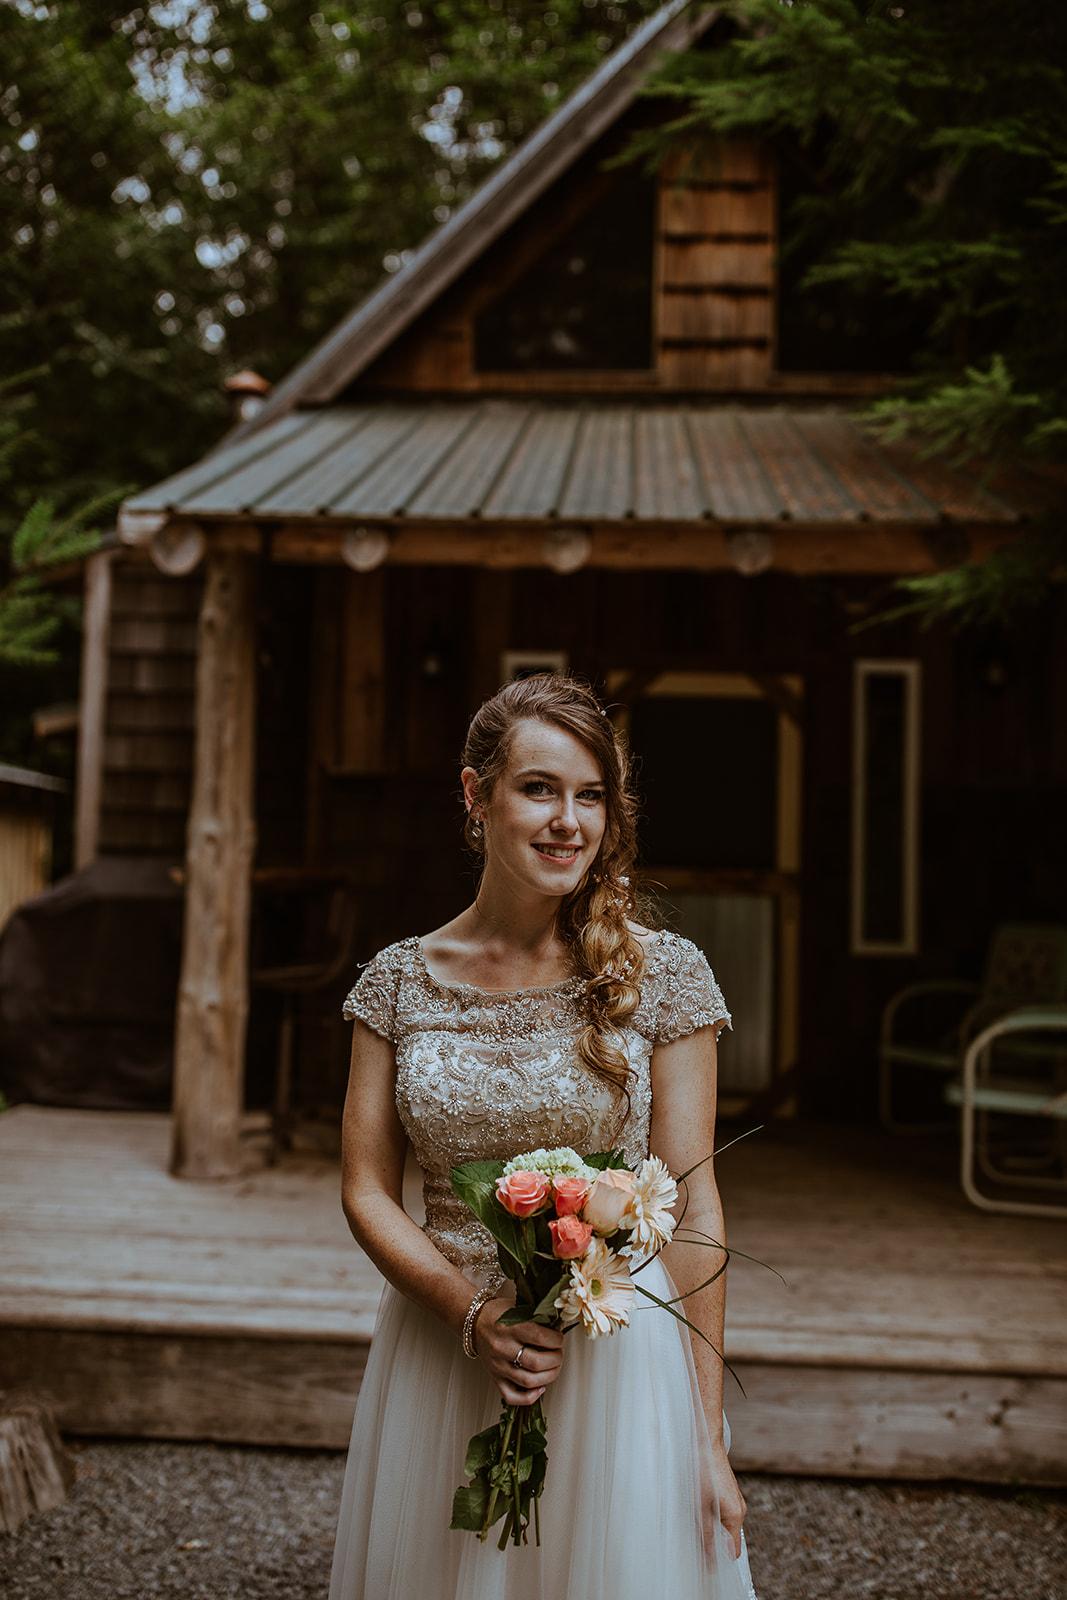 mount-rainier-cabin-elopement-megan-gallagher-photography_(157_of_568).jpg